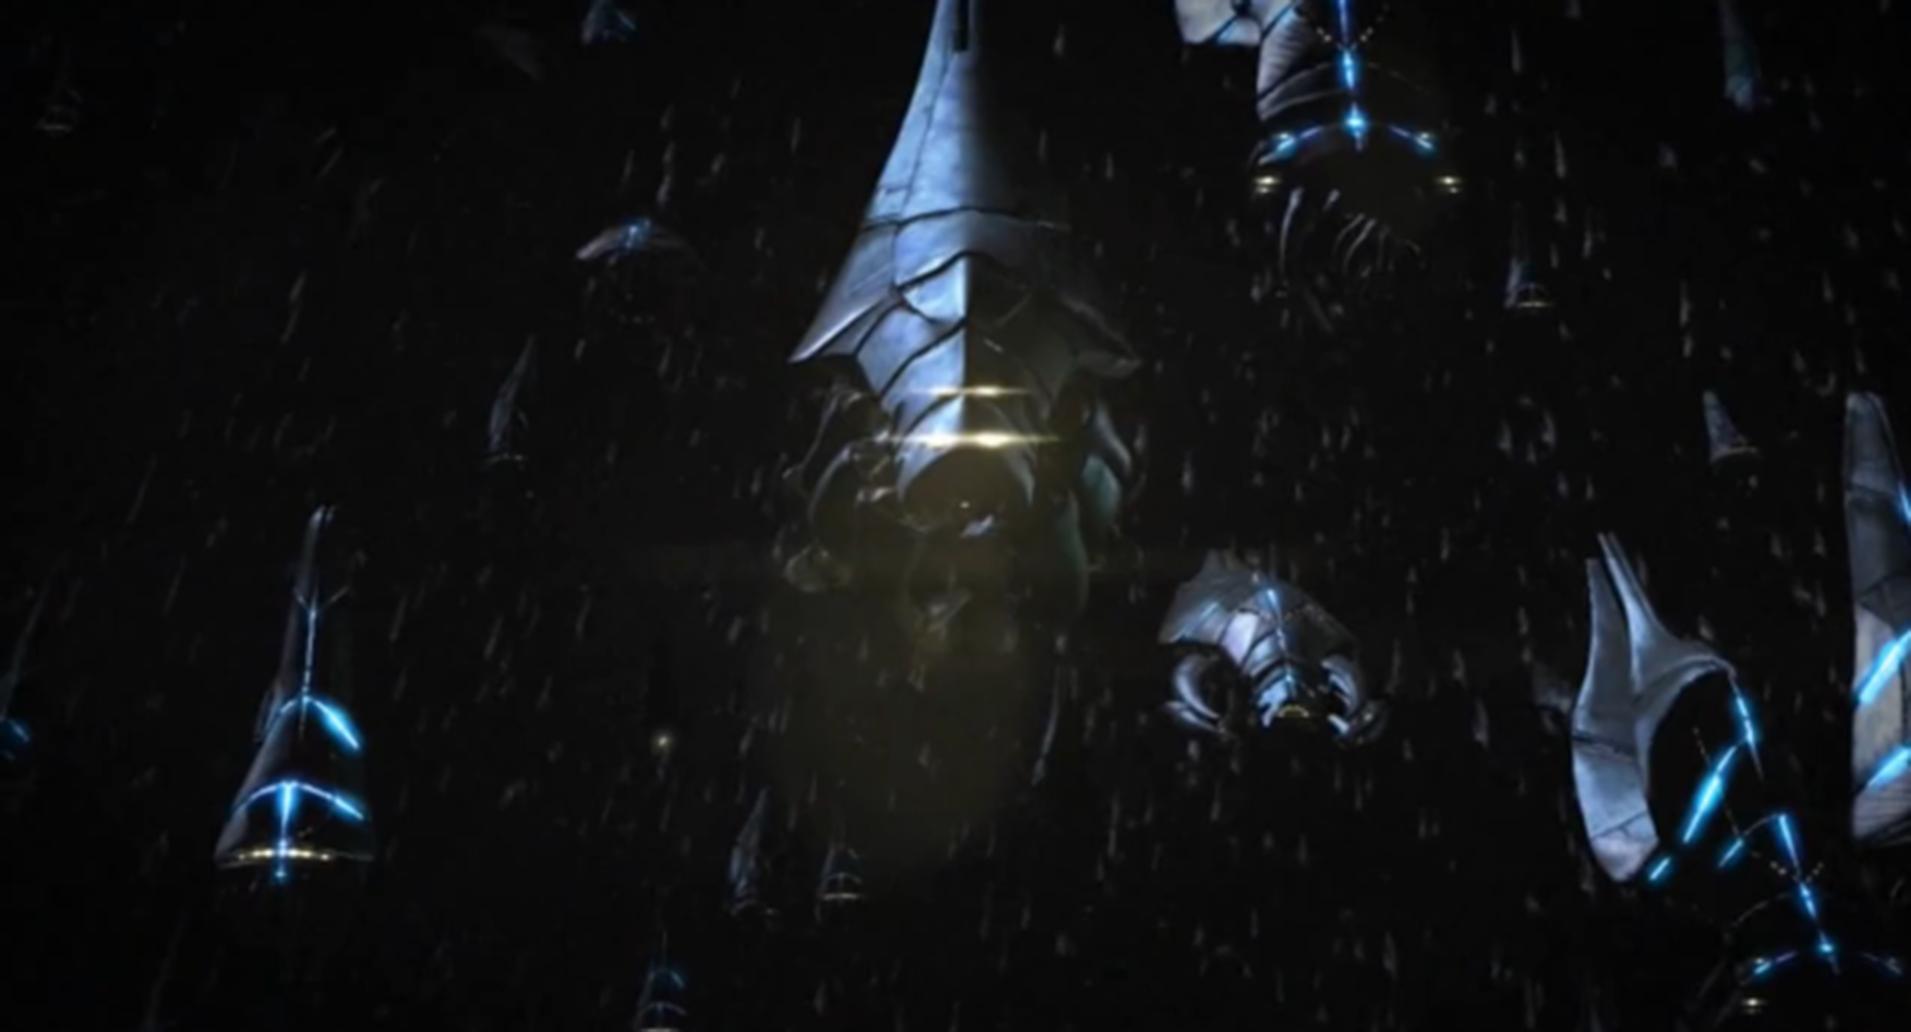 The Reaper fleet beyond the Milky Way